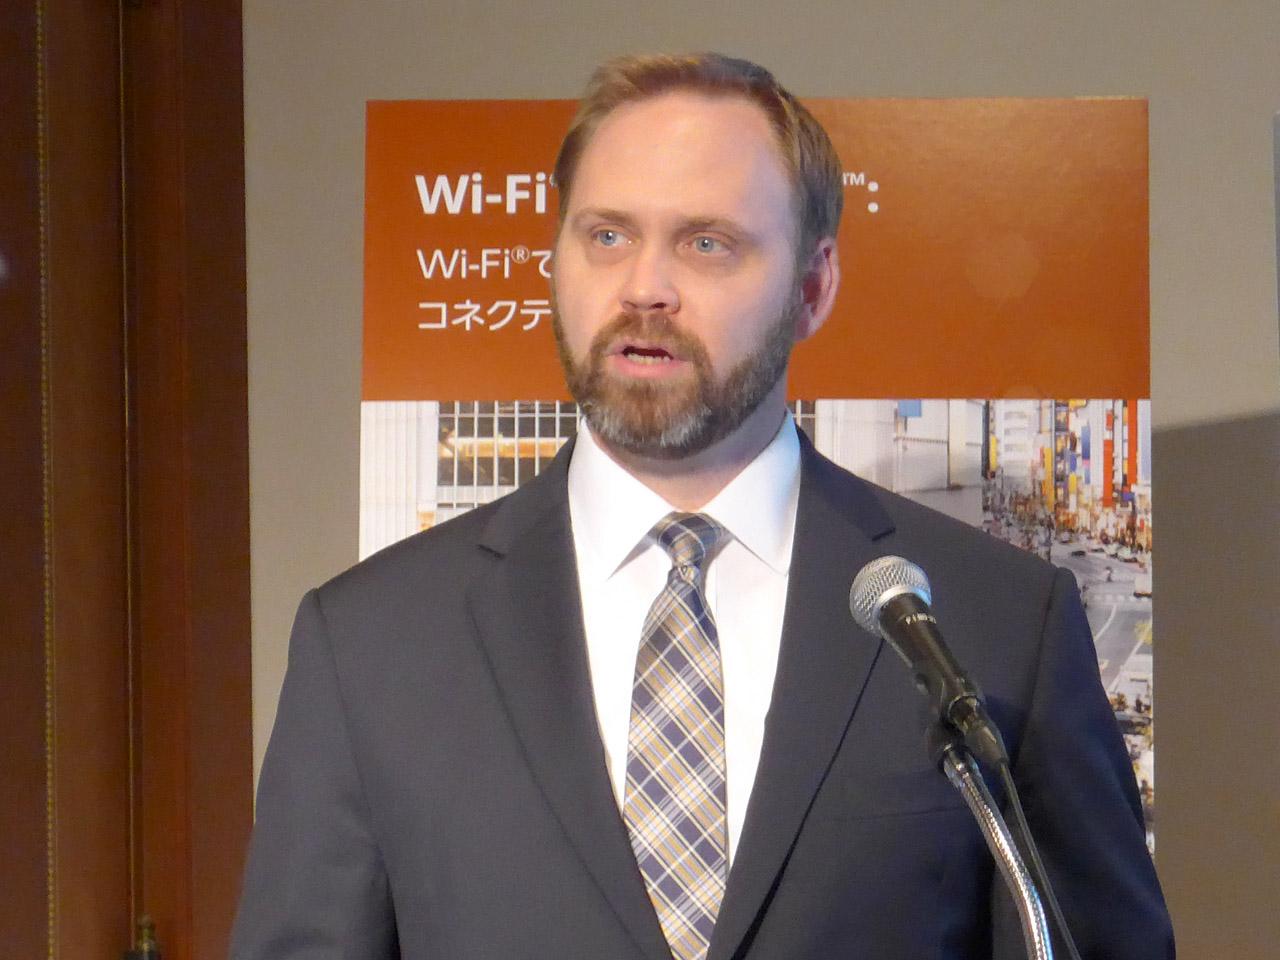 Wi-Fi Allianceマーケティング担当バイス・プレジデントのケビン・ロビンソン氏(2017年7月国内説明会での登壇時)